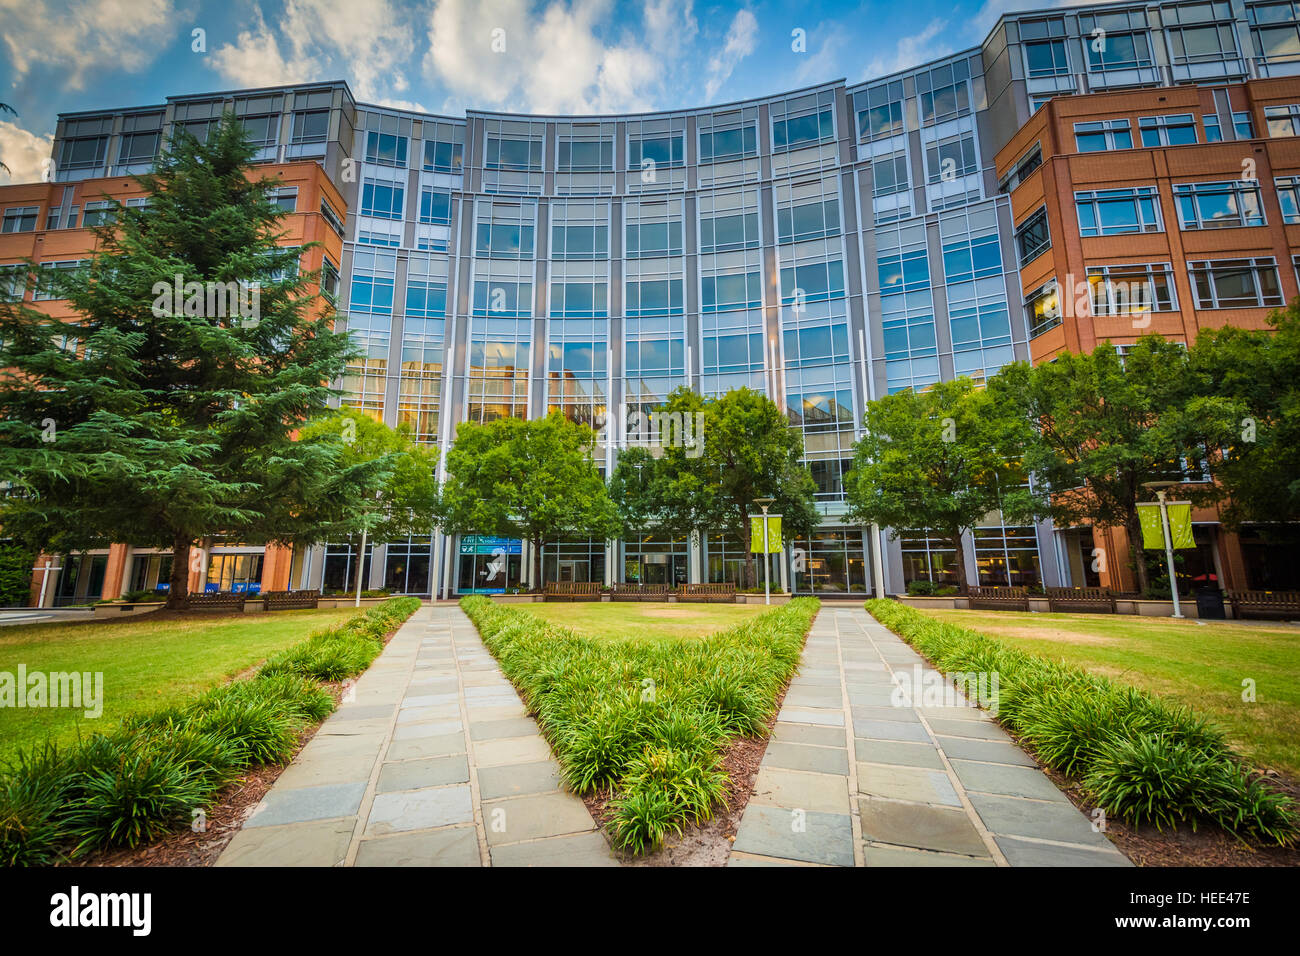 Walkways and building at Johnson & Wales University, in Charlotte, North Carolina. Stock Photo